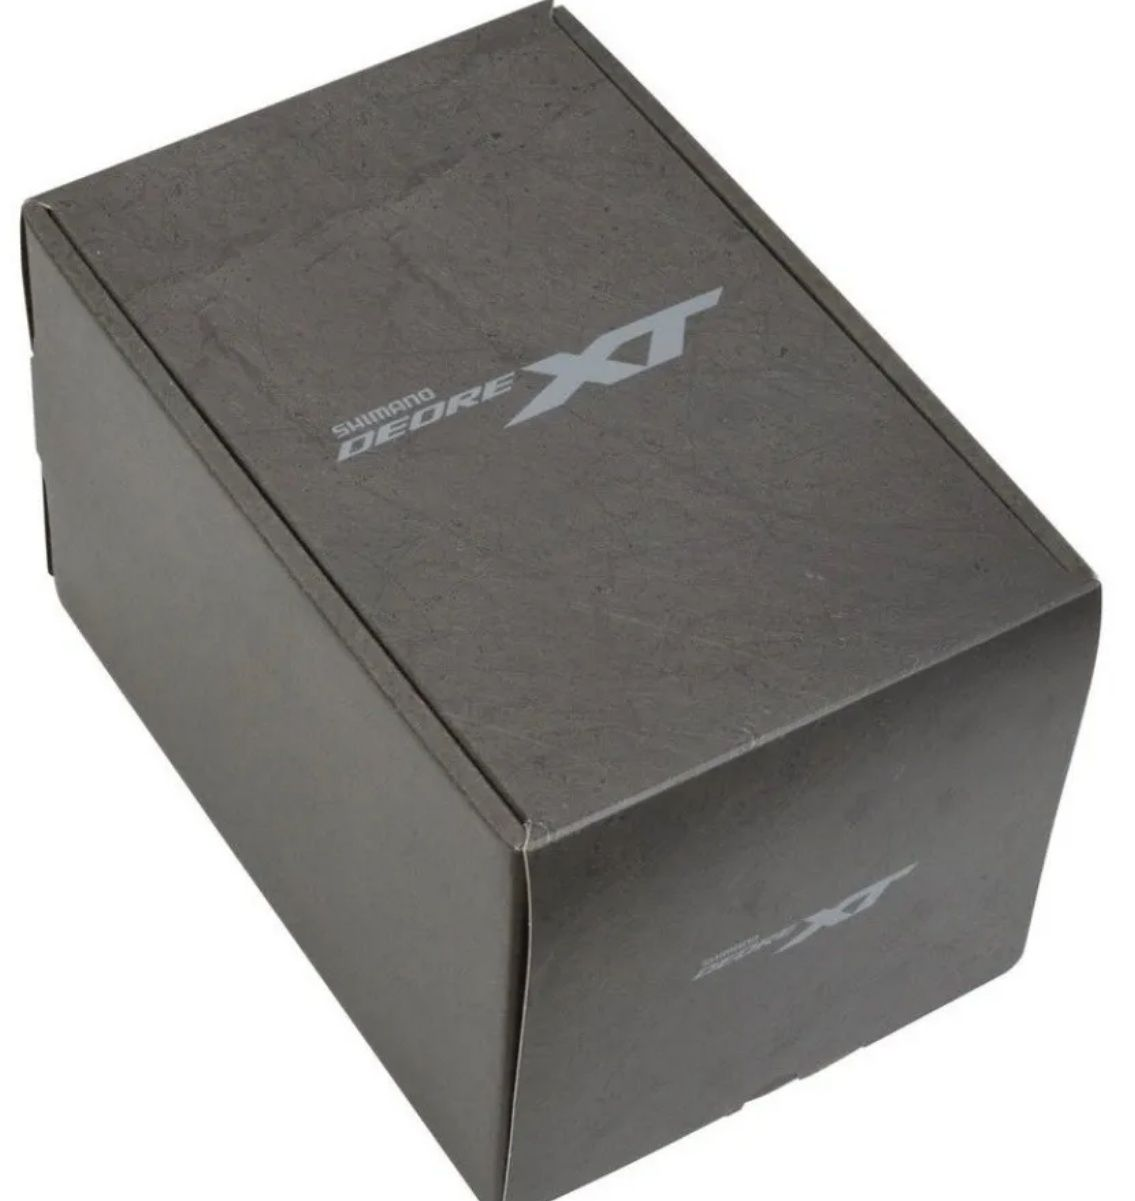 Pedivela Shimano Deore Xt M8100 12v Sem Coroa 175mm